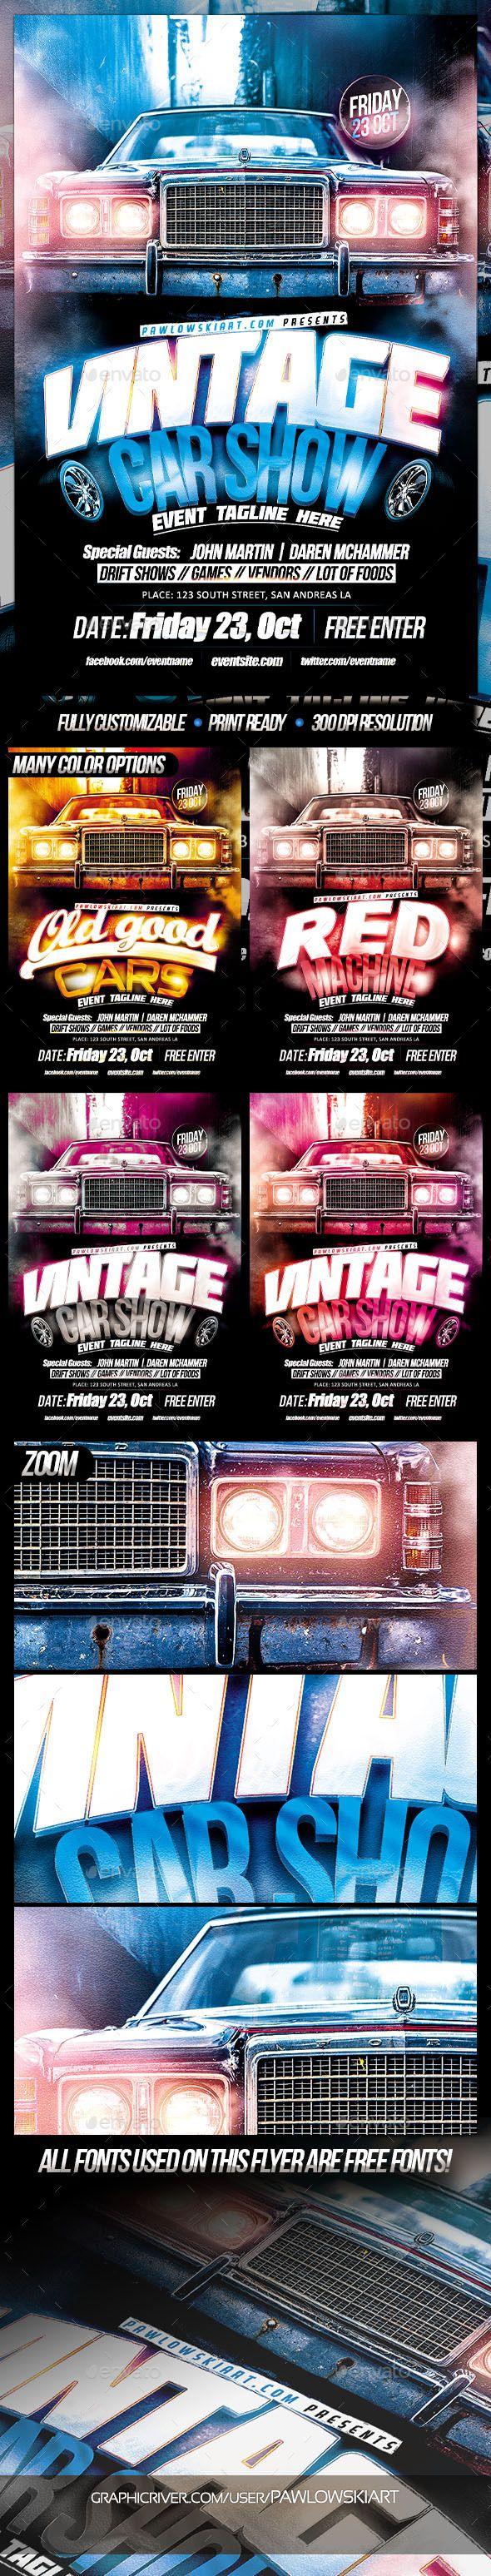 Vintage Car Show Event Flyer Template  Event Flyer Templates